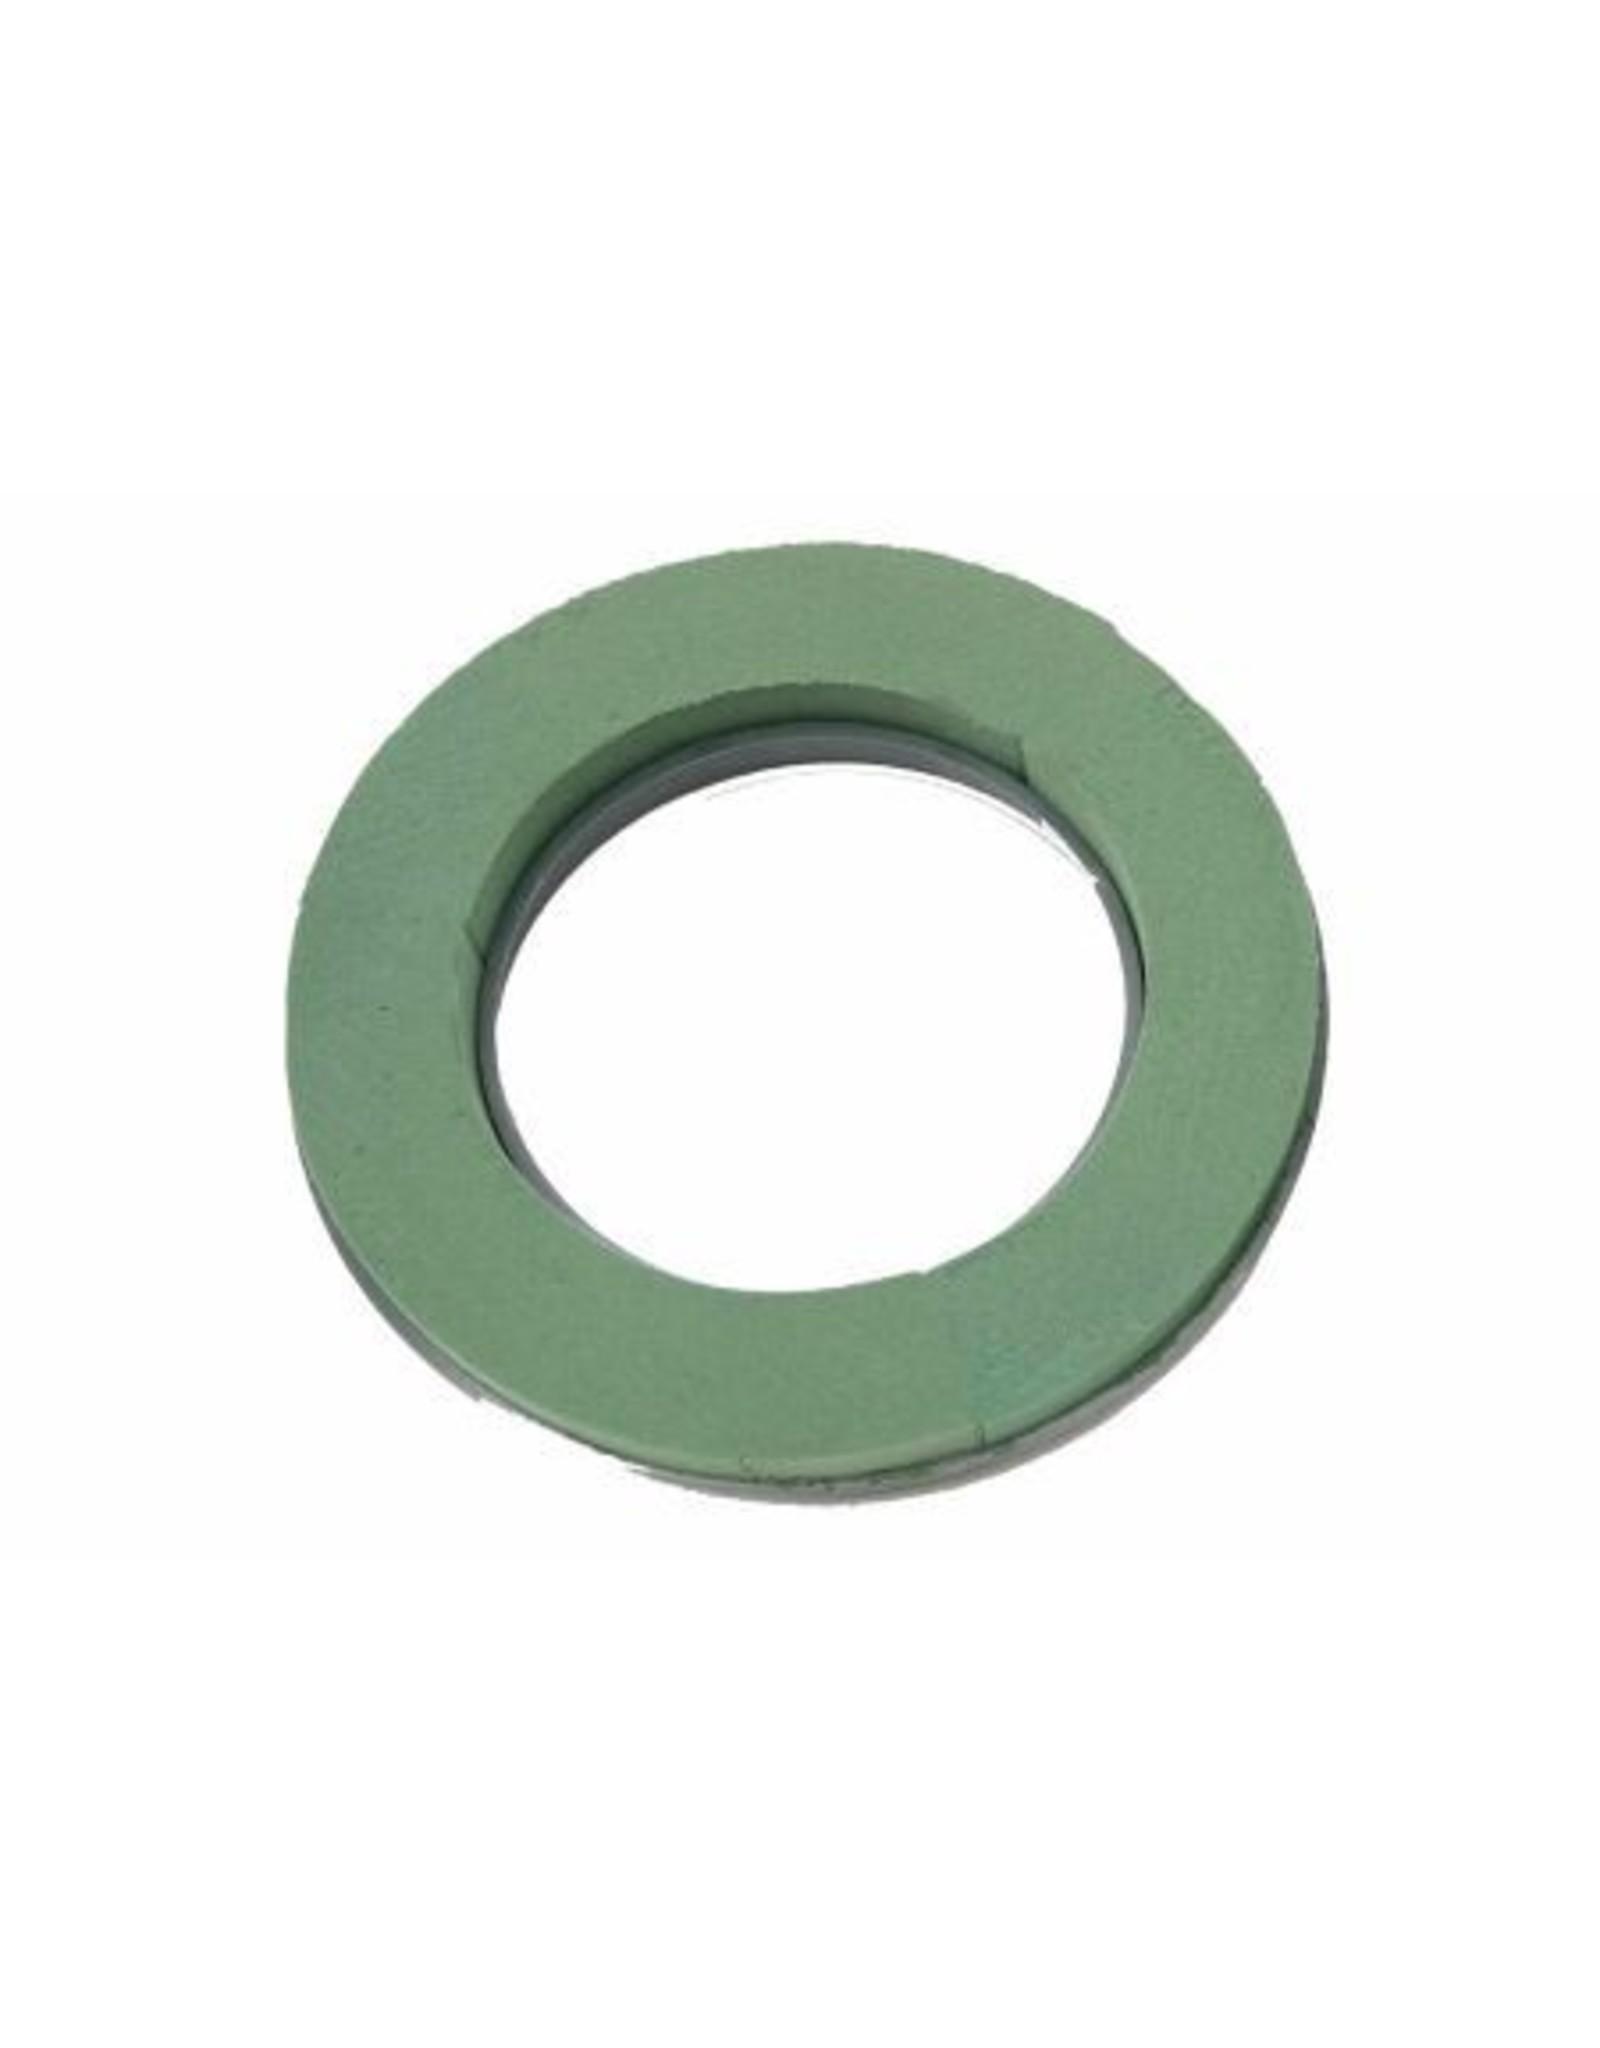 HD Basic Ring Sld Foam D20.0 x 60